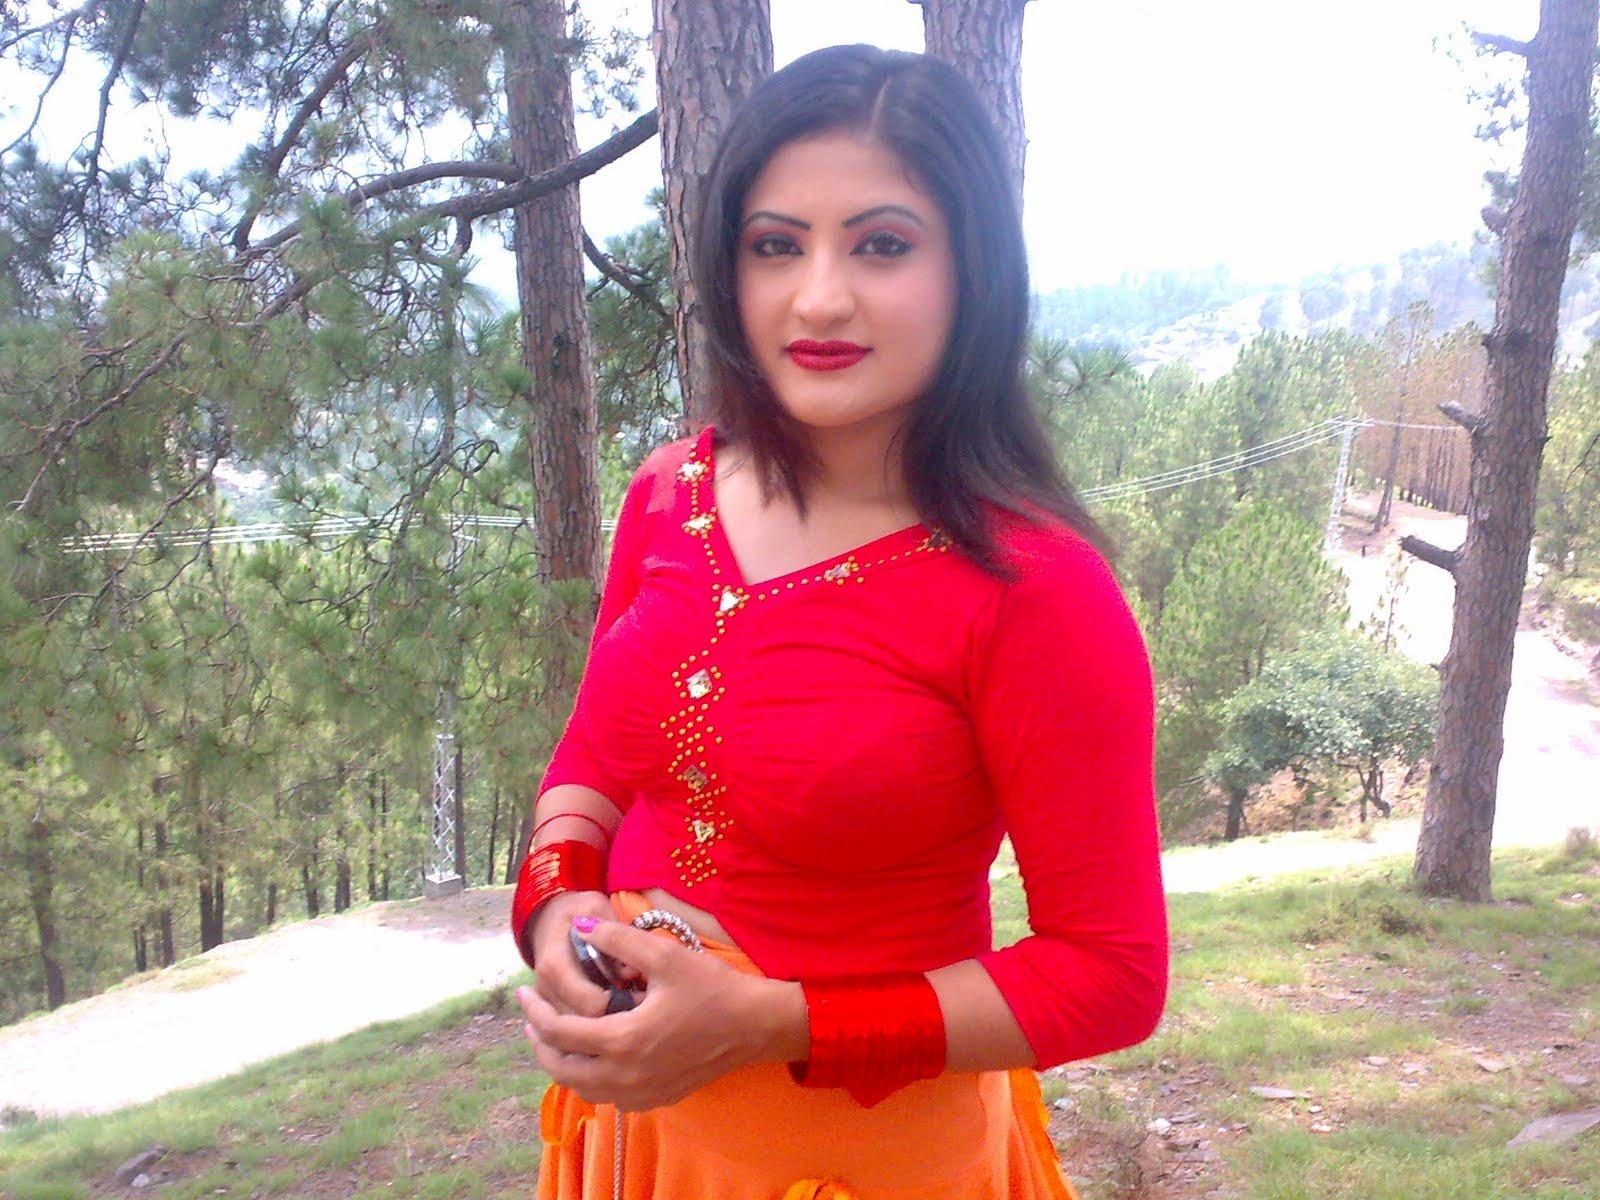 Pashto Cd Drama Top Dancer Actress Sahiba Noor Pictures -6450